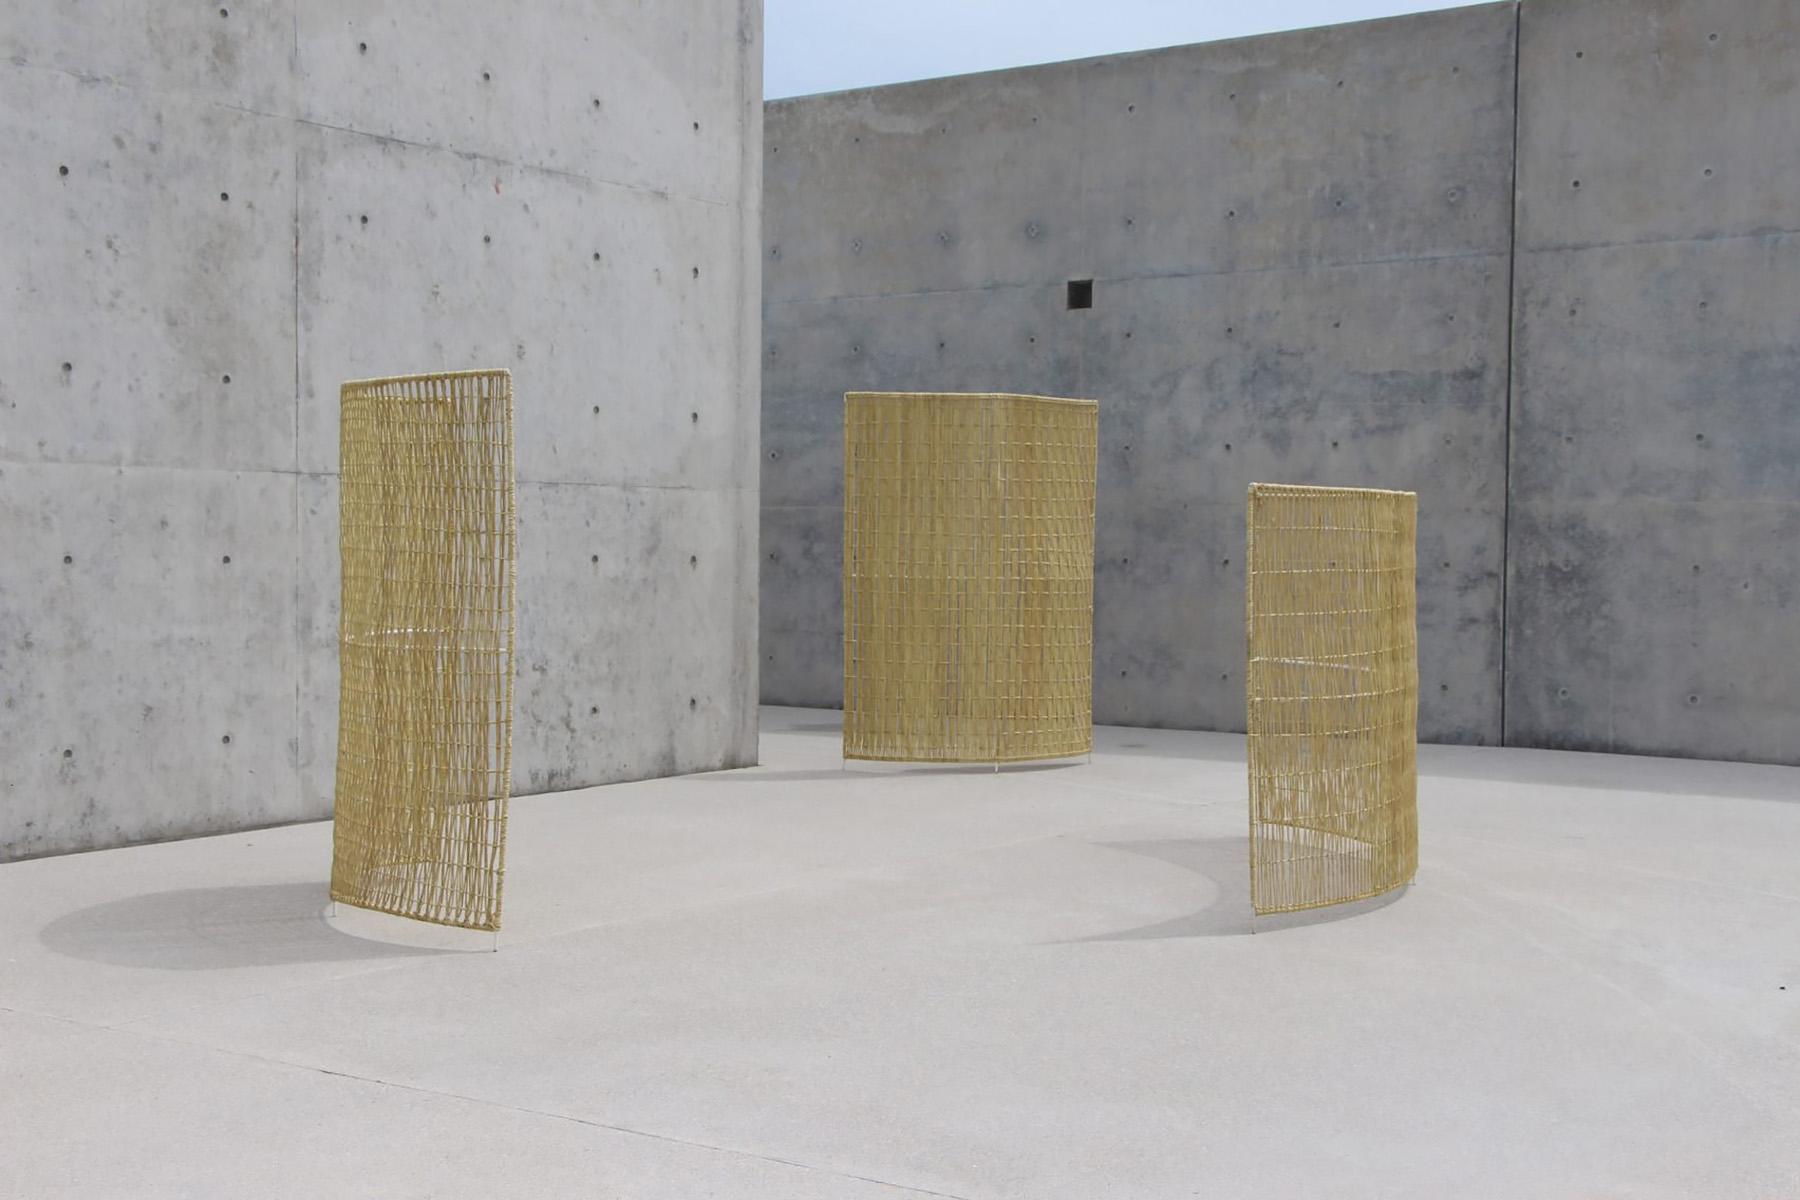 iGNANT-Design-Julie-Richoz-Nicolas-Le-Moigne-Woven-Screens-Lights-3